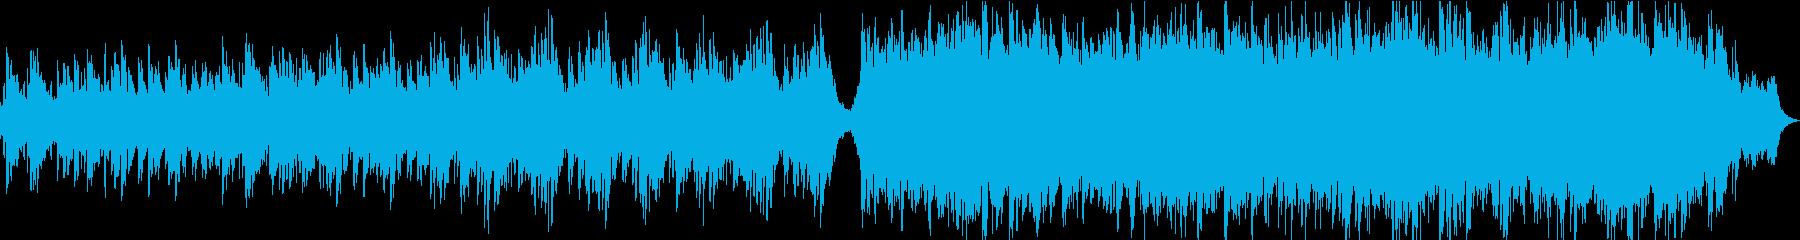 Background Pianoの再生済みの波形